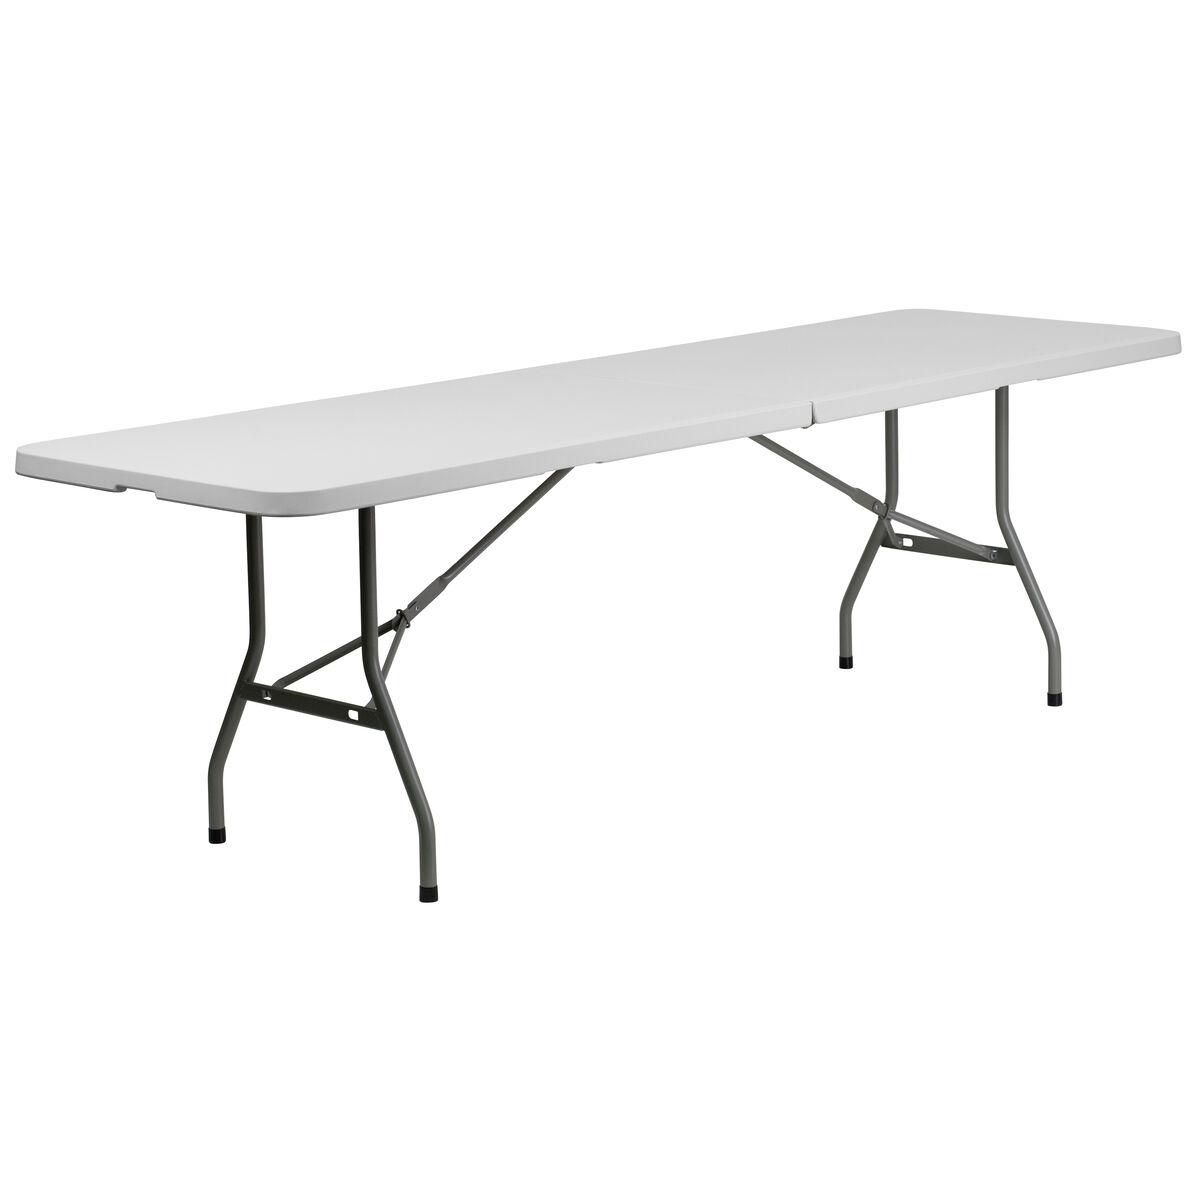 30x96 white plastic fold table rb 3096fh gg foldingchairs4less com